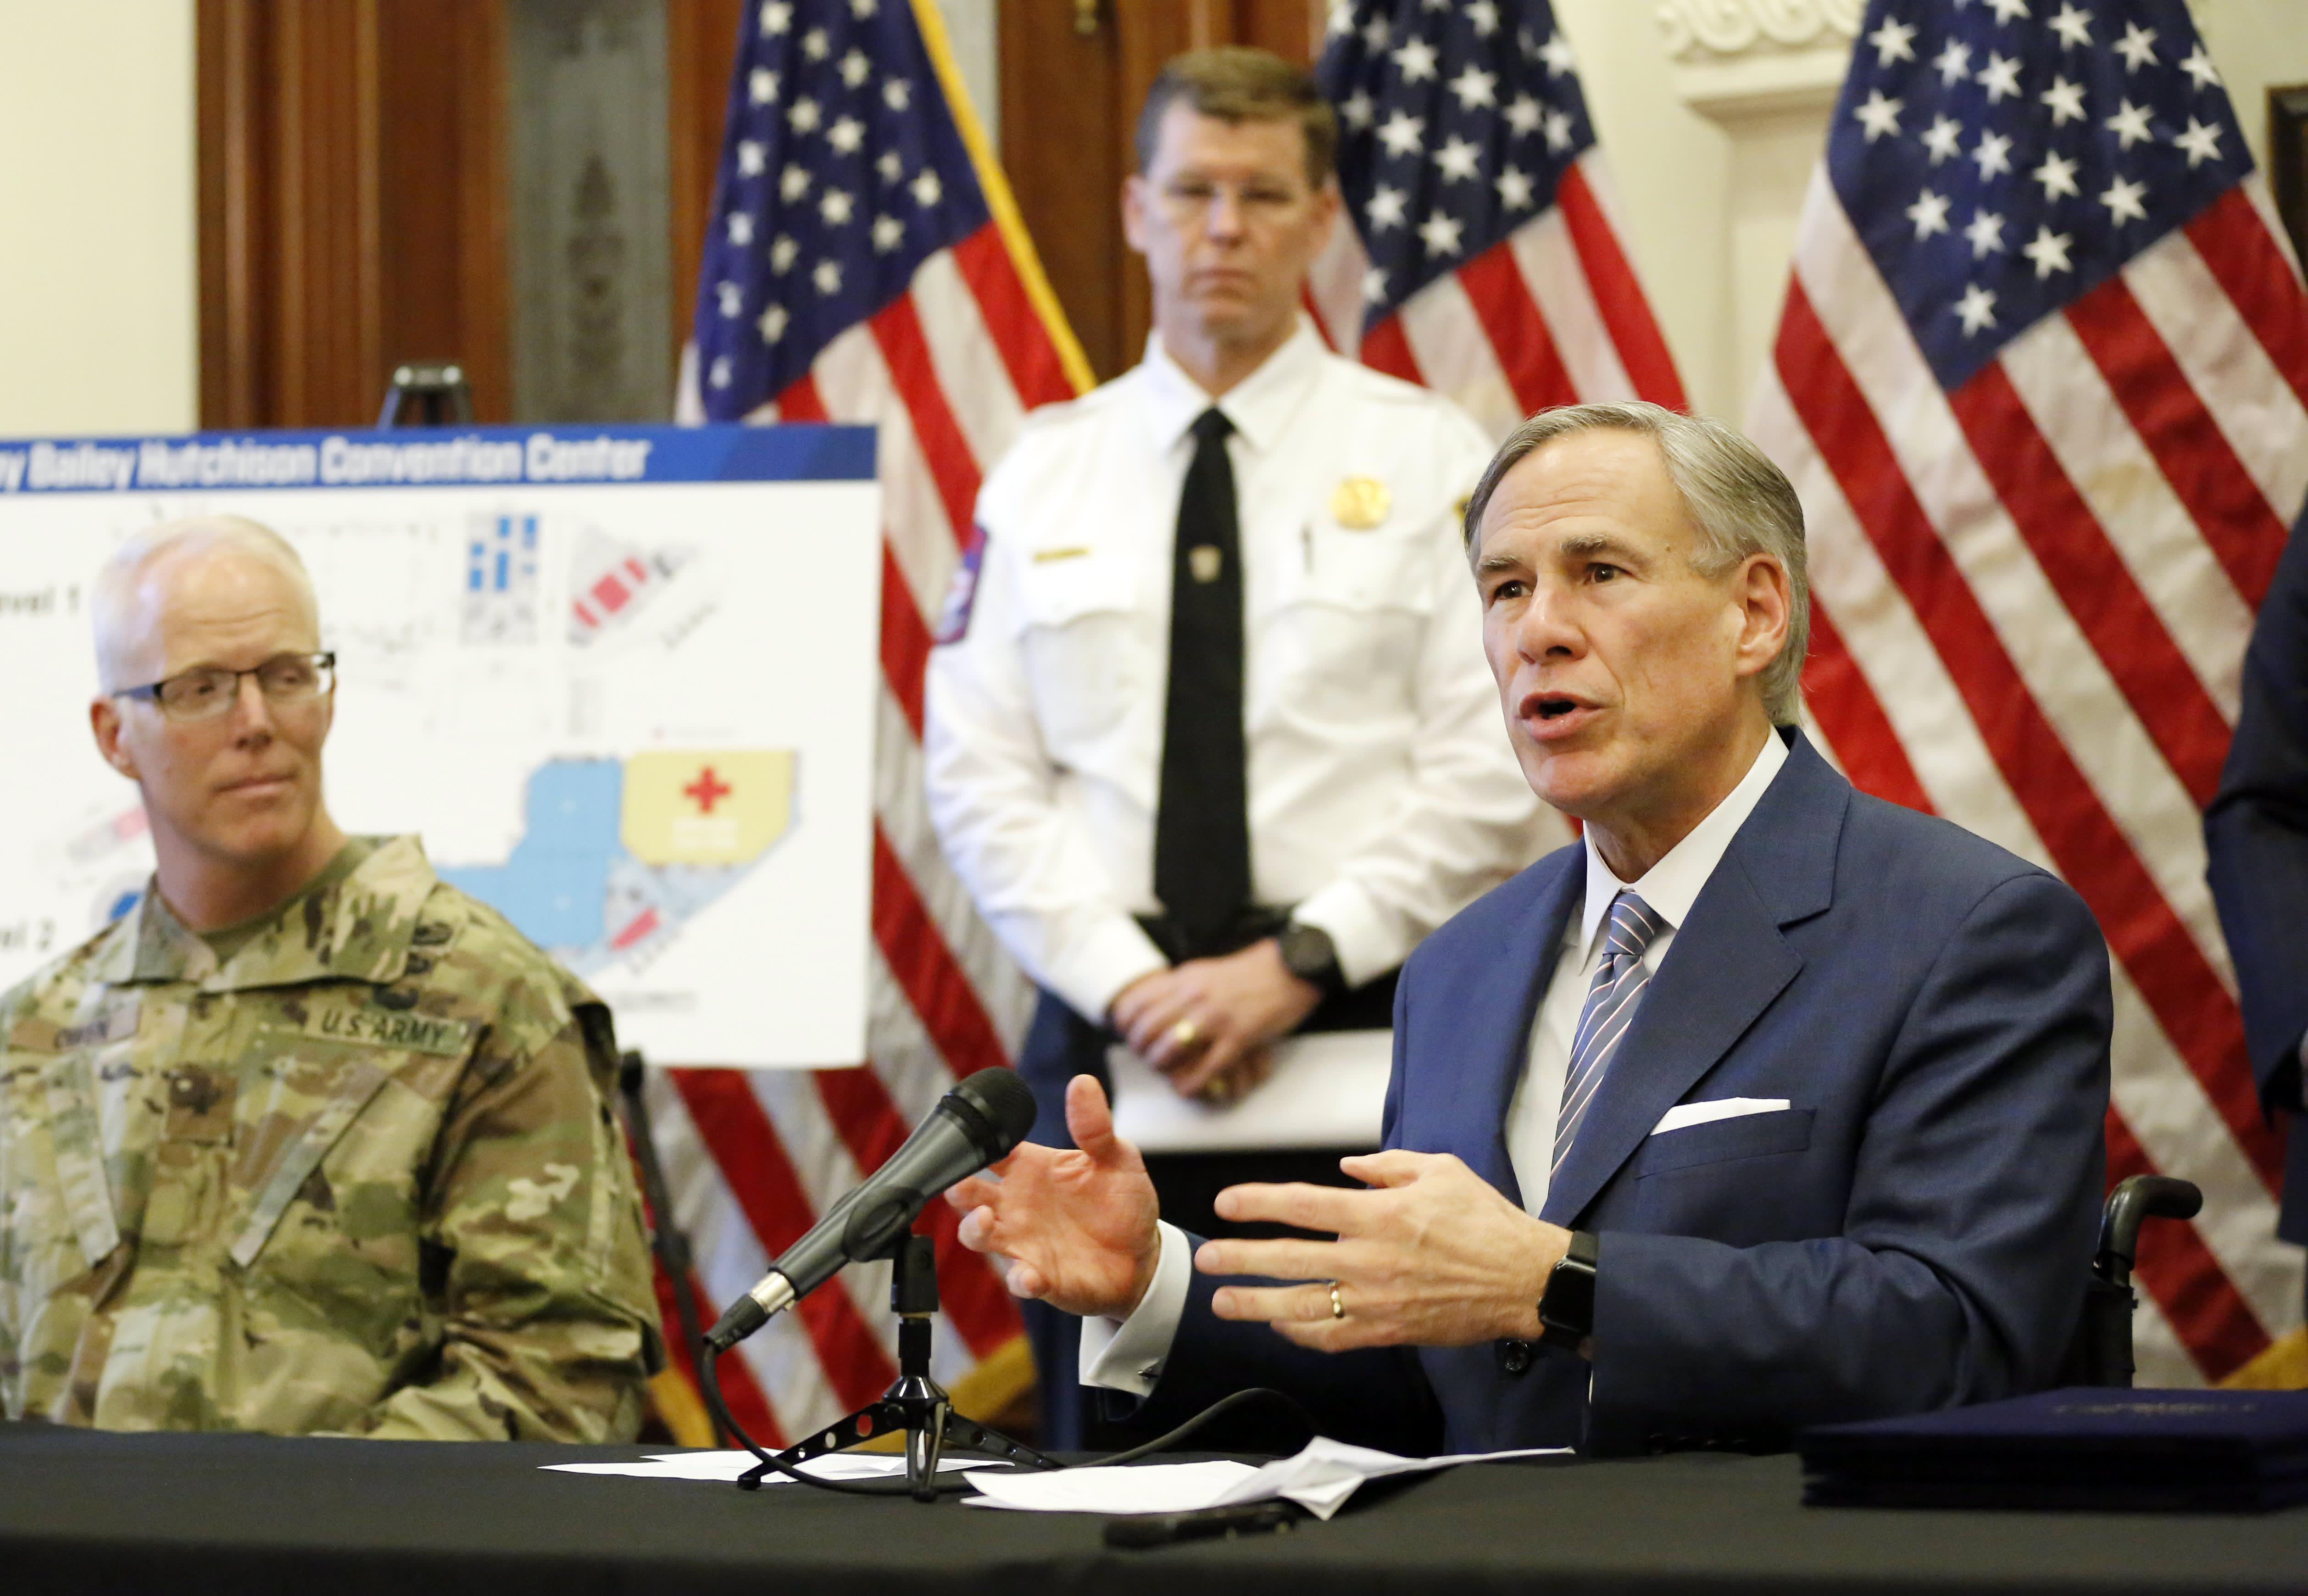 Texas Gov. Abbott blames Covid spread on immigrants, criticizes Biden's 'Neanderthal' comment - CNBC